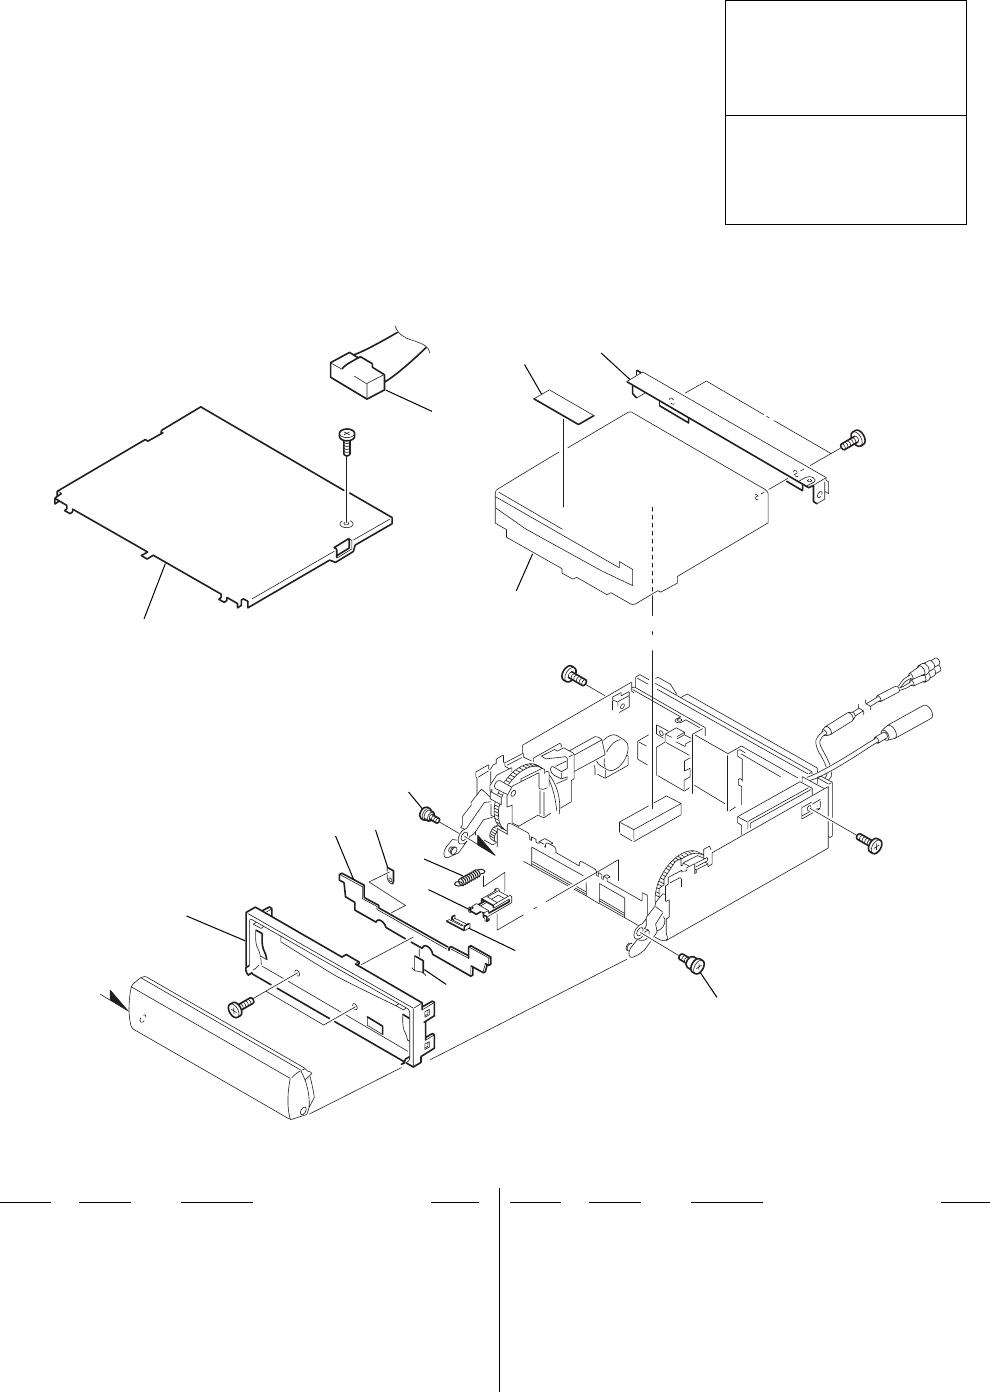 Sony CDX M800 Service Manual. Www.s manuals.com. Manual